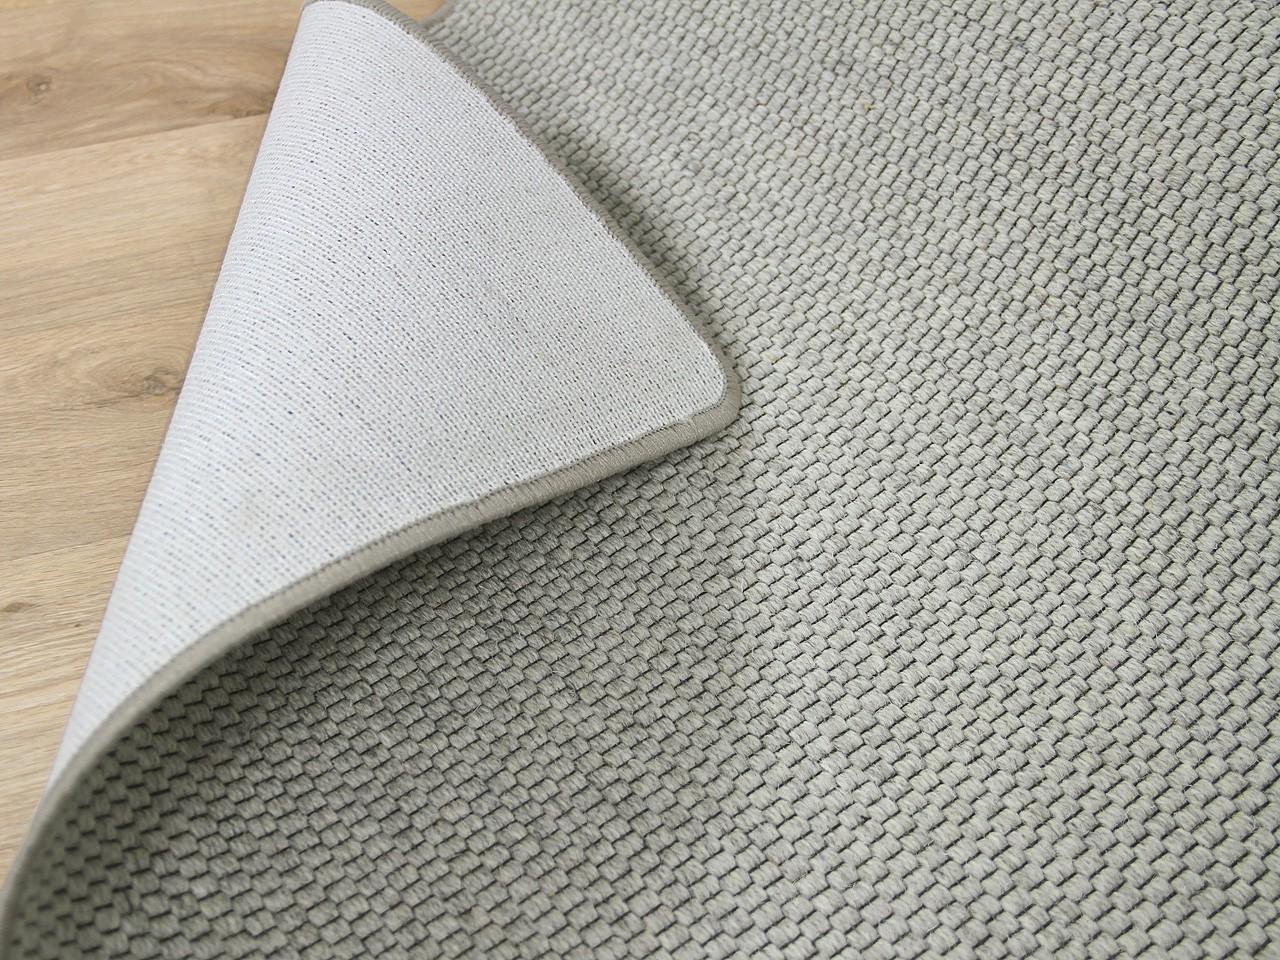 natur teppich wolle bentzon flachgewebe grau teppiche sisal und naturteppiche bentzon flachgewebe. Black Bedroom Furniture Sets. Home Design Ideas